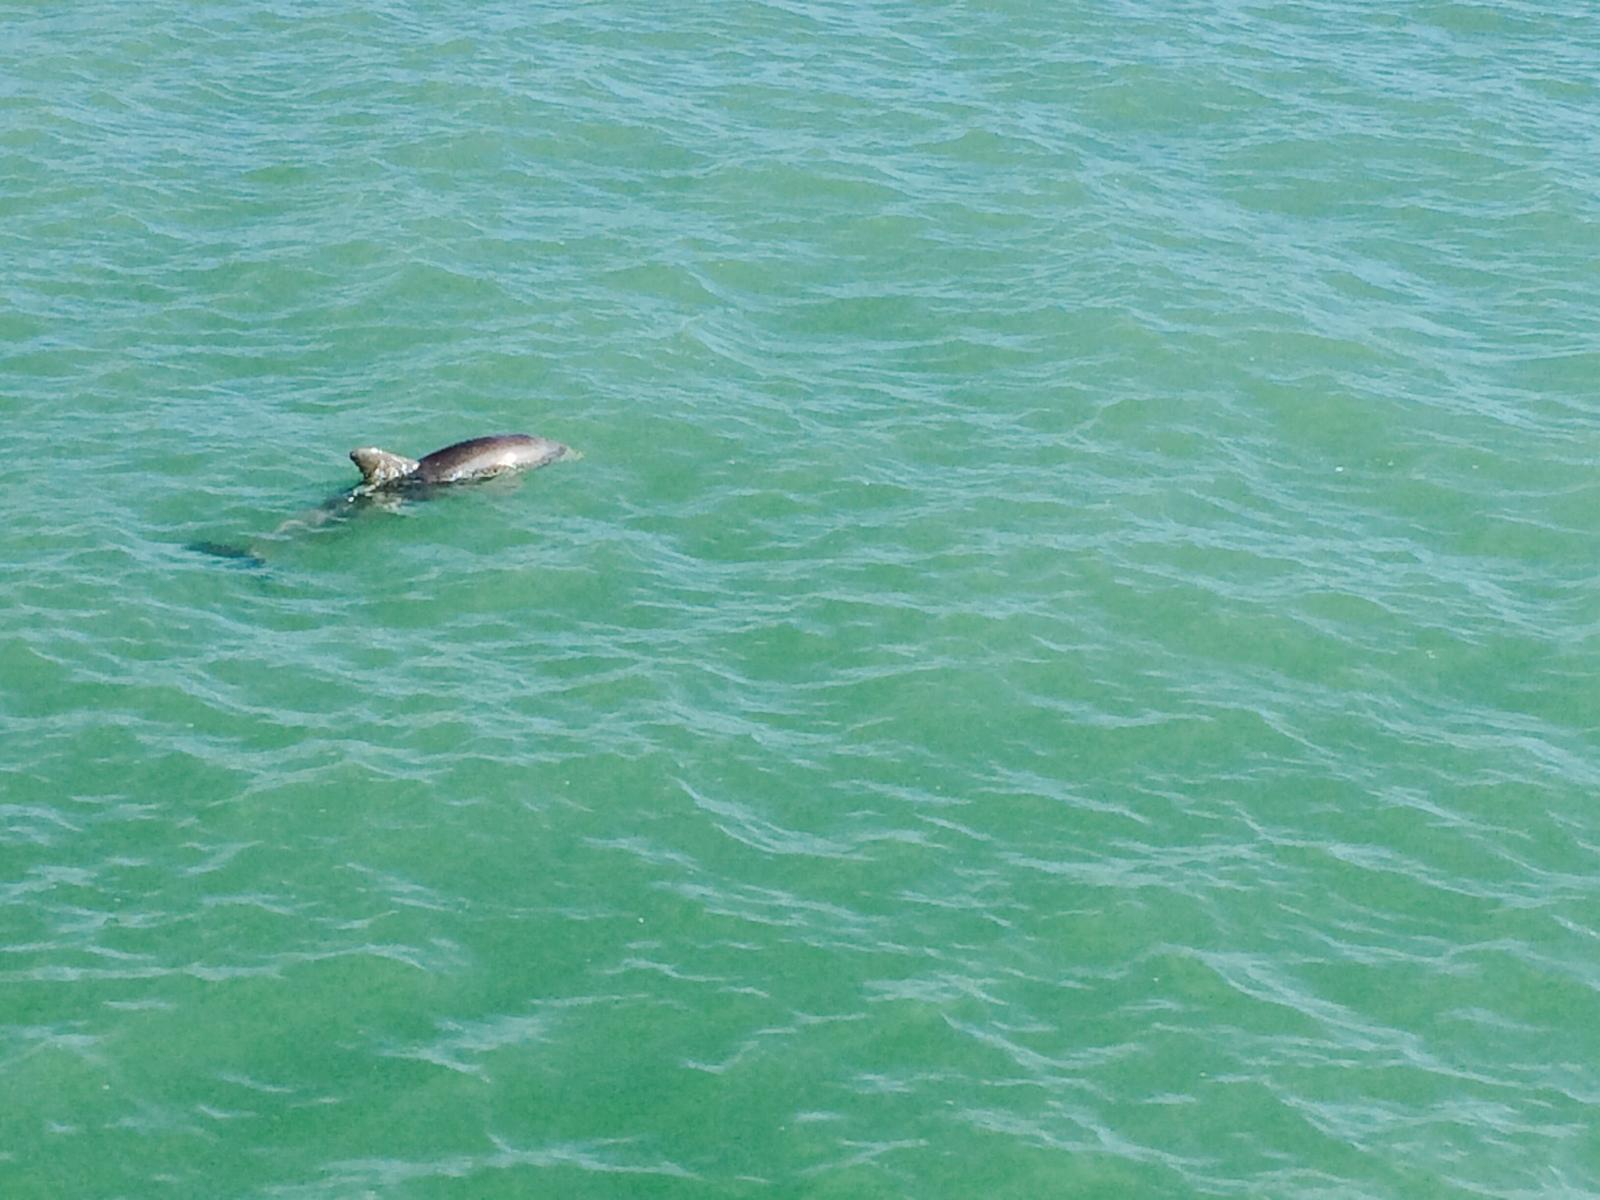 Naples dauphins